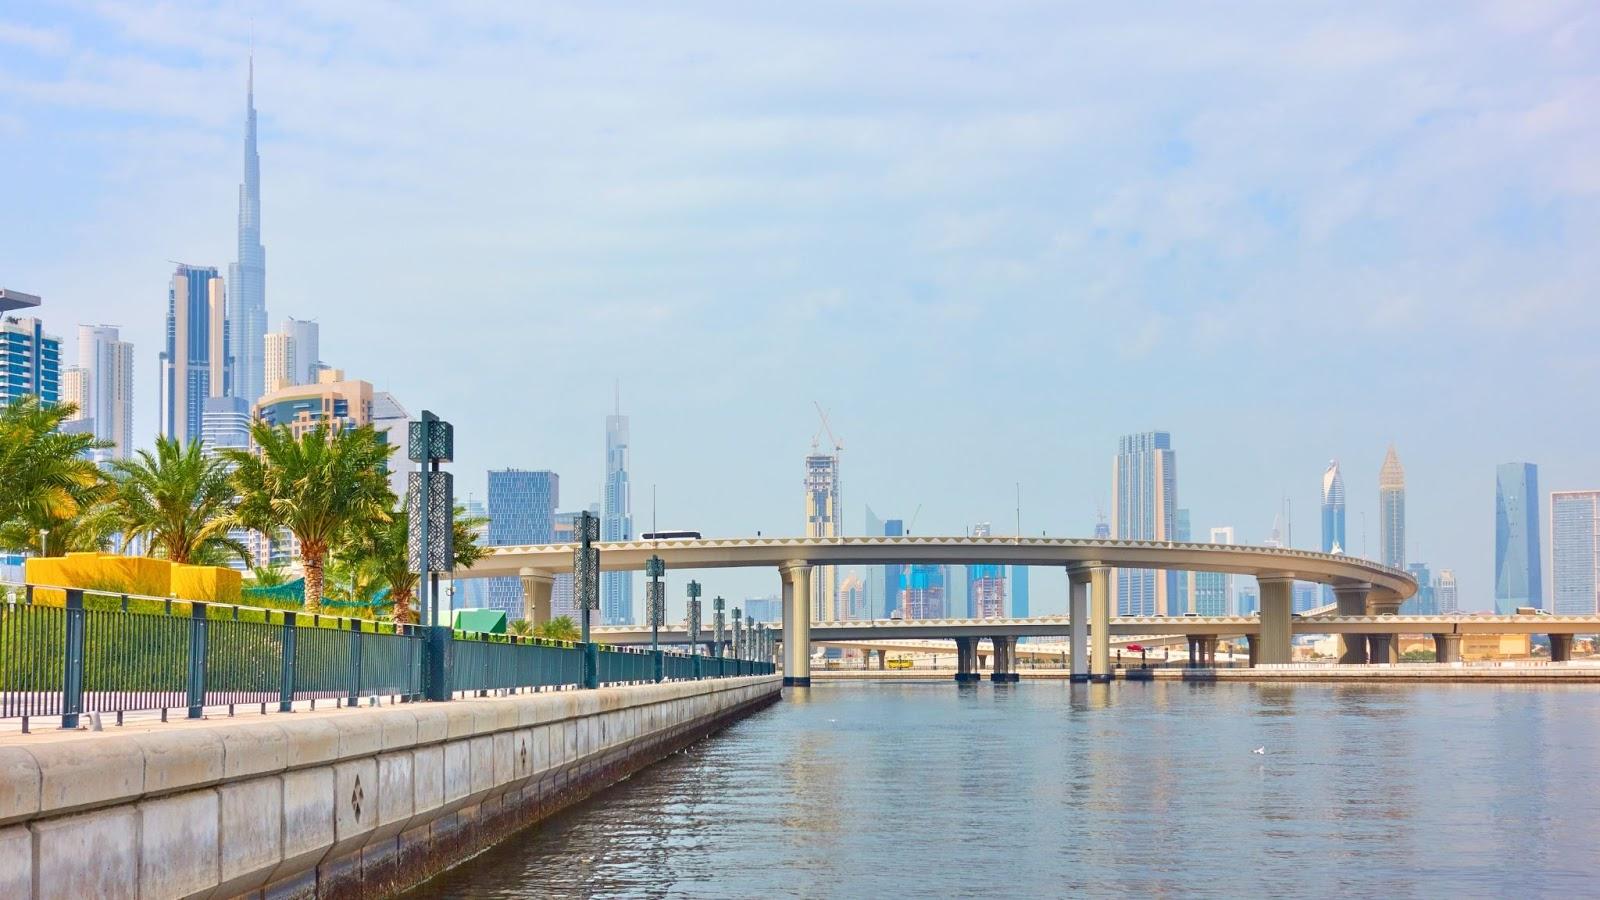 Dubai Design District waterfront